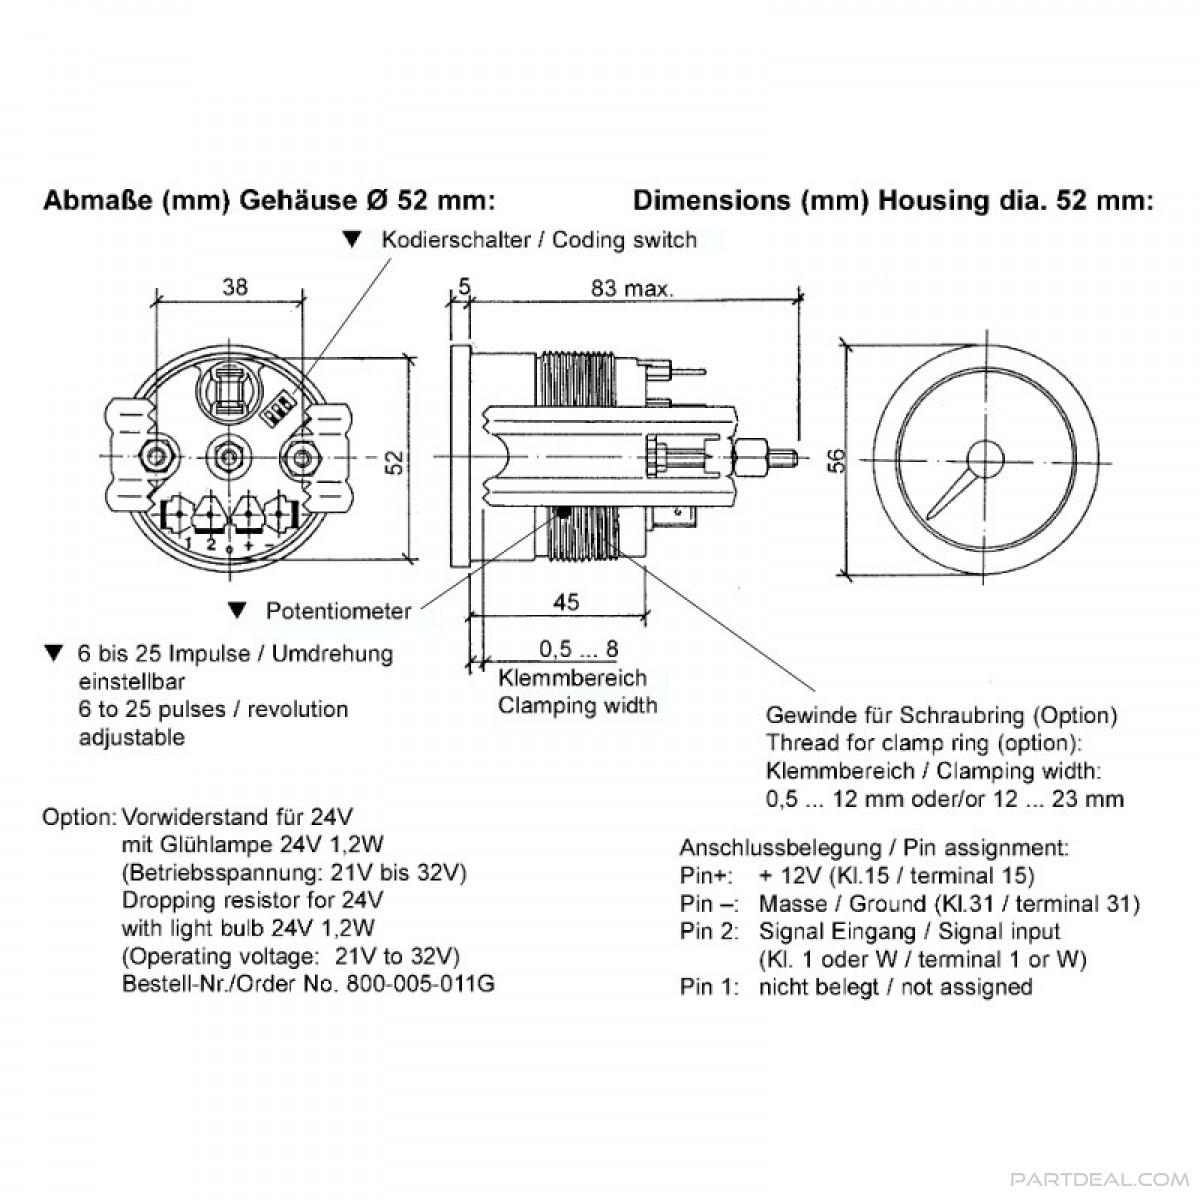 Vdo Marine Tachometer Wiring Diagram - Data Wiring Diagram Schematic - Tachometer Wiring Diagram